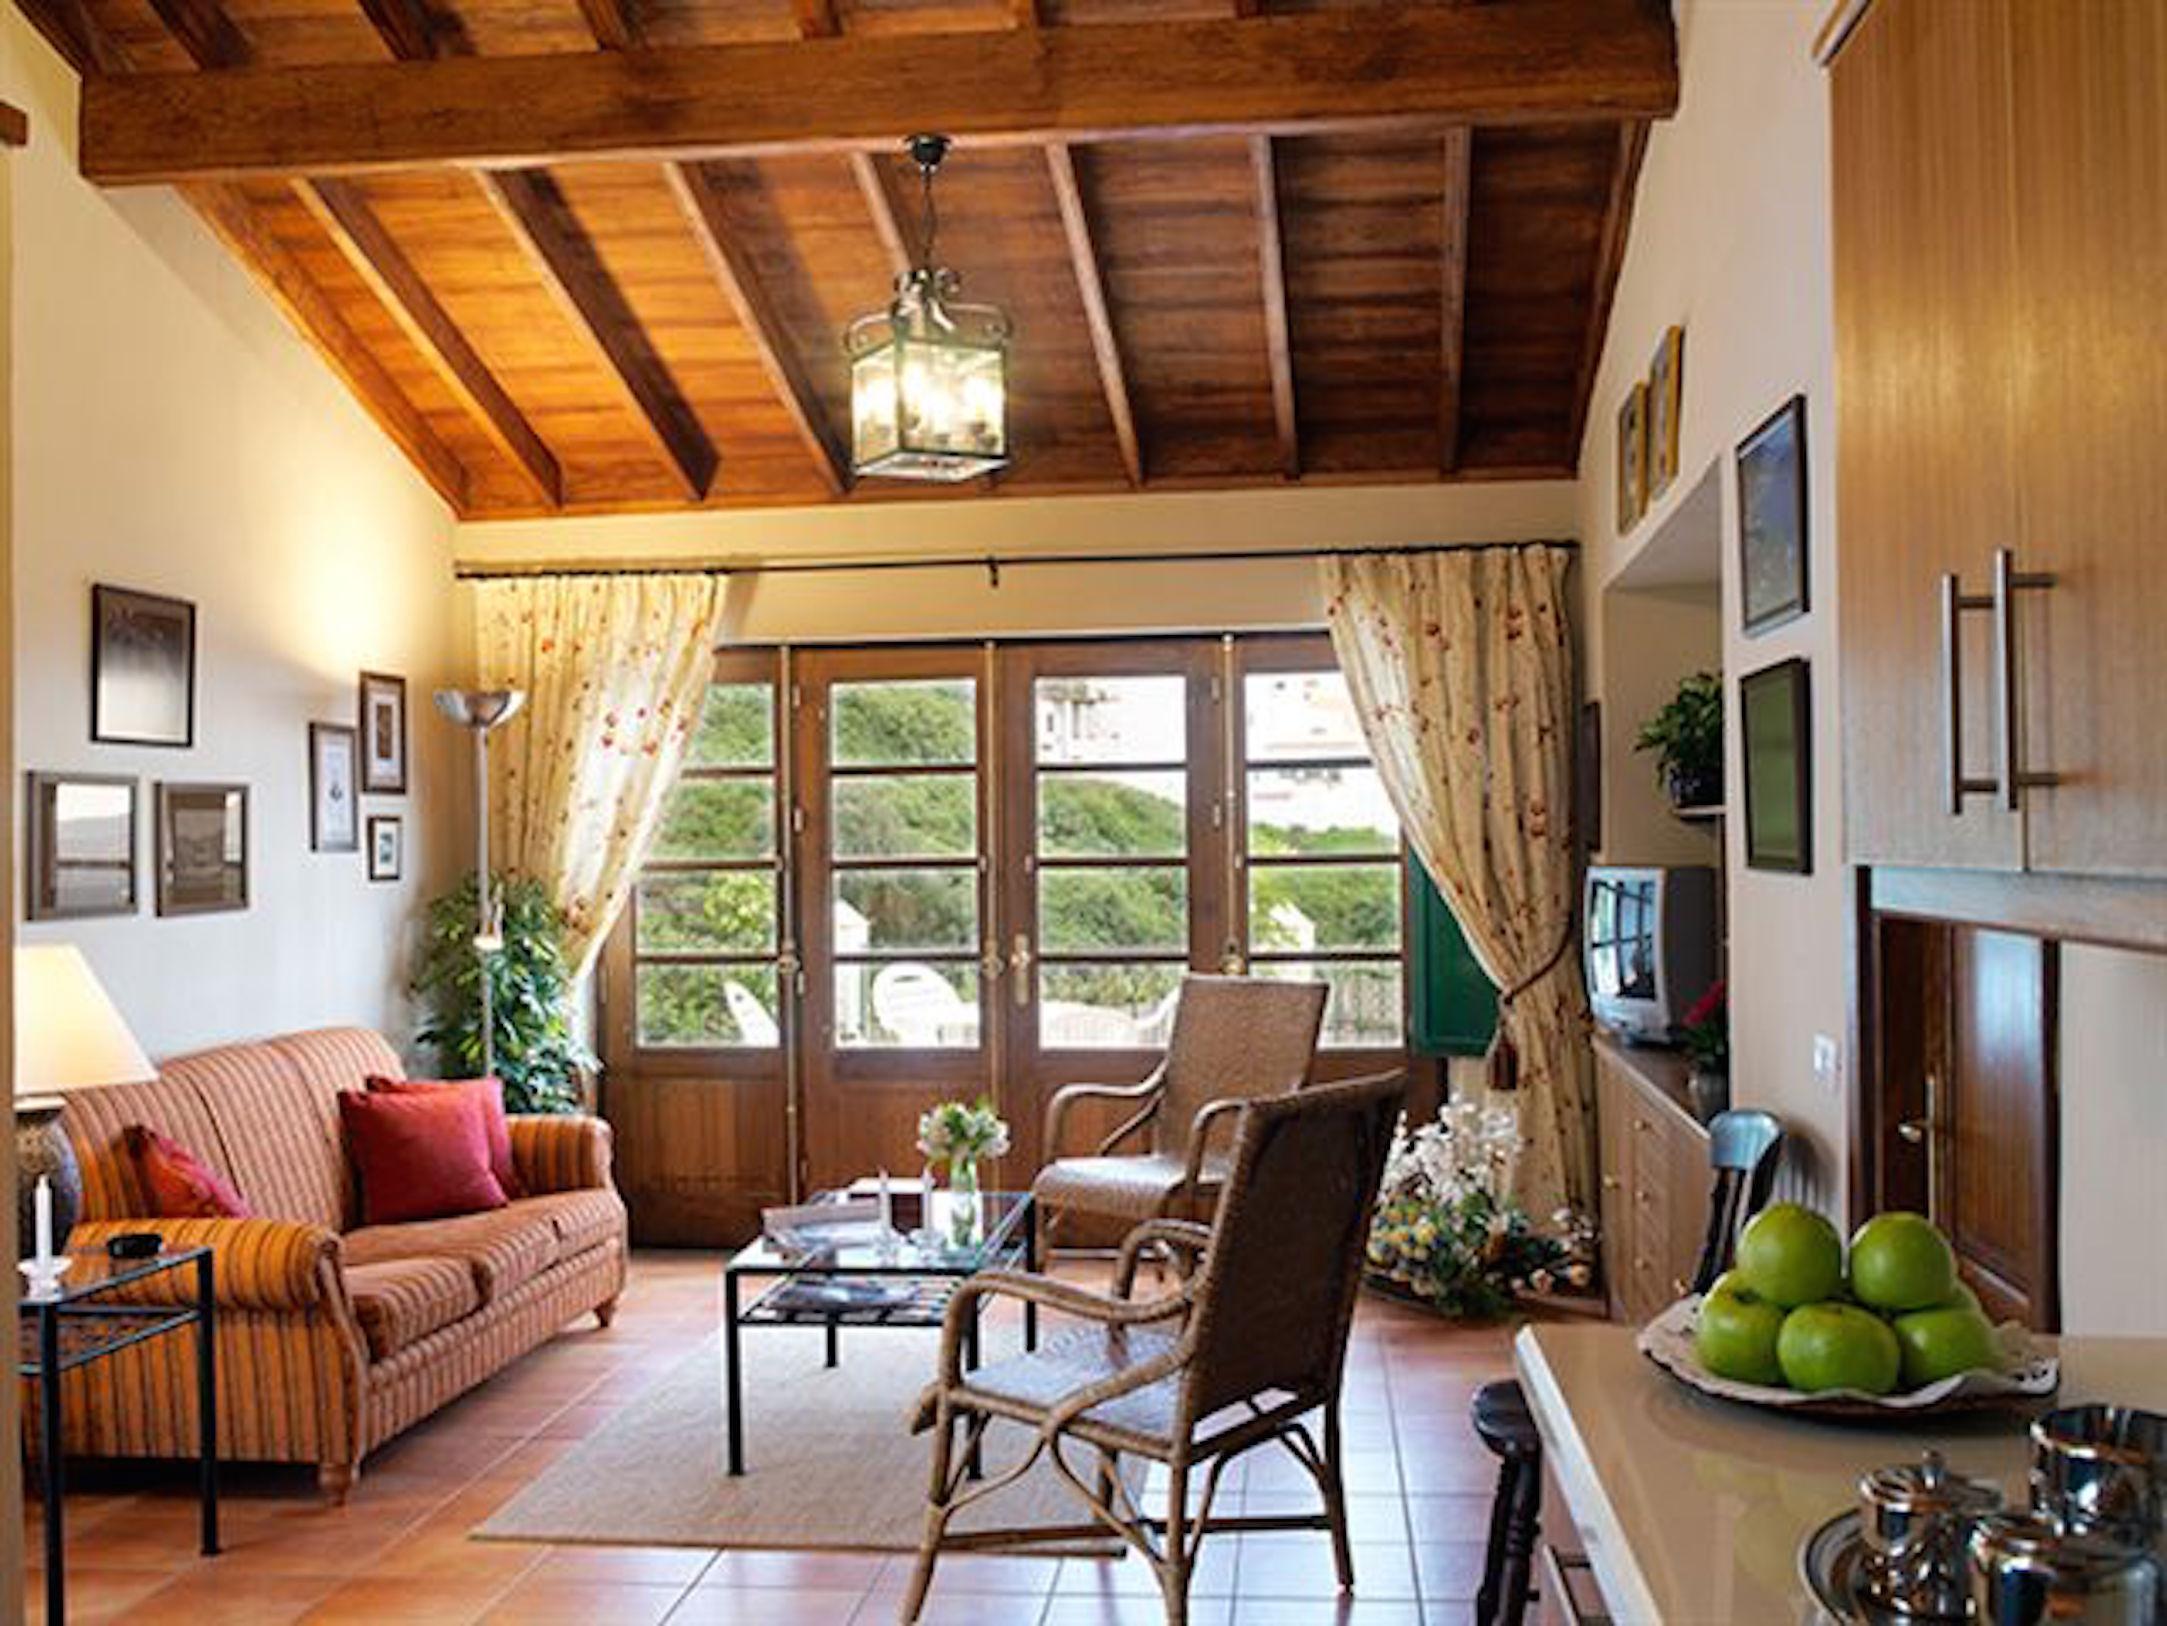 Maison de vacances La Hacienda, Free Wifi Grill (2196689), Garachico, Ténérife, Iles Canaries, Espagne, image 8